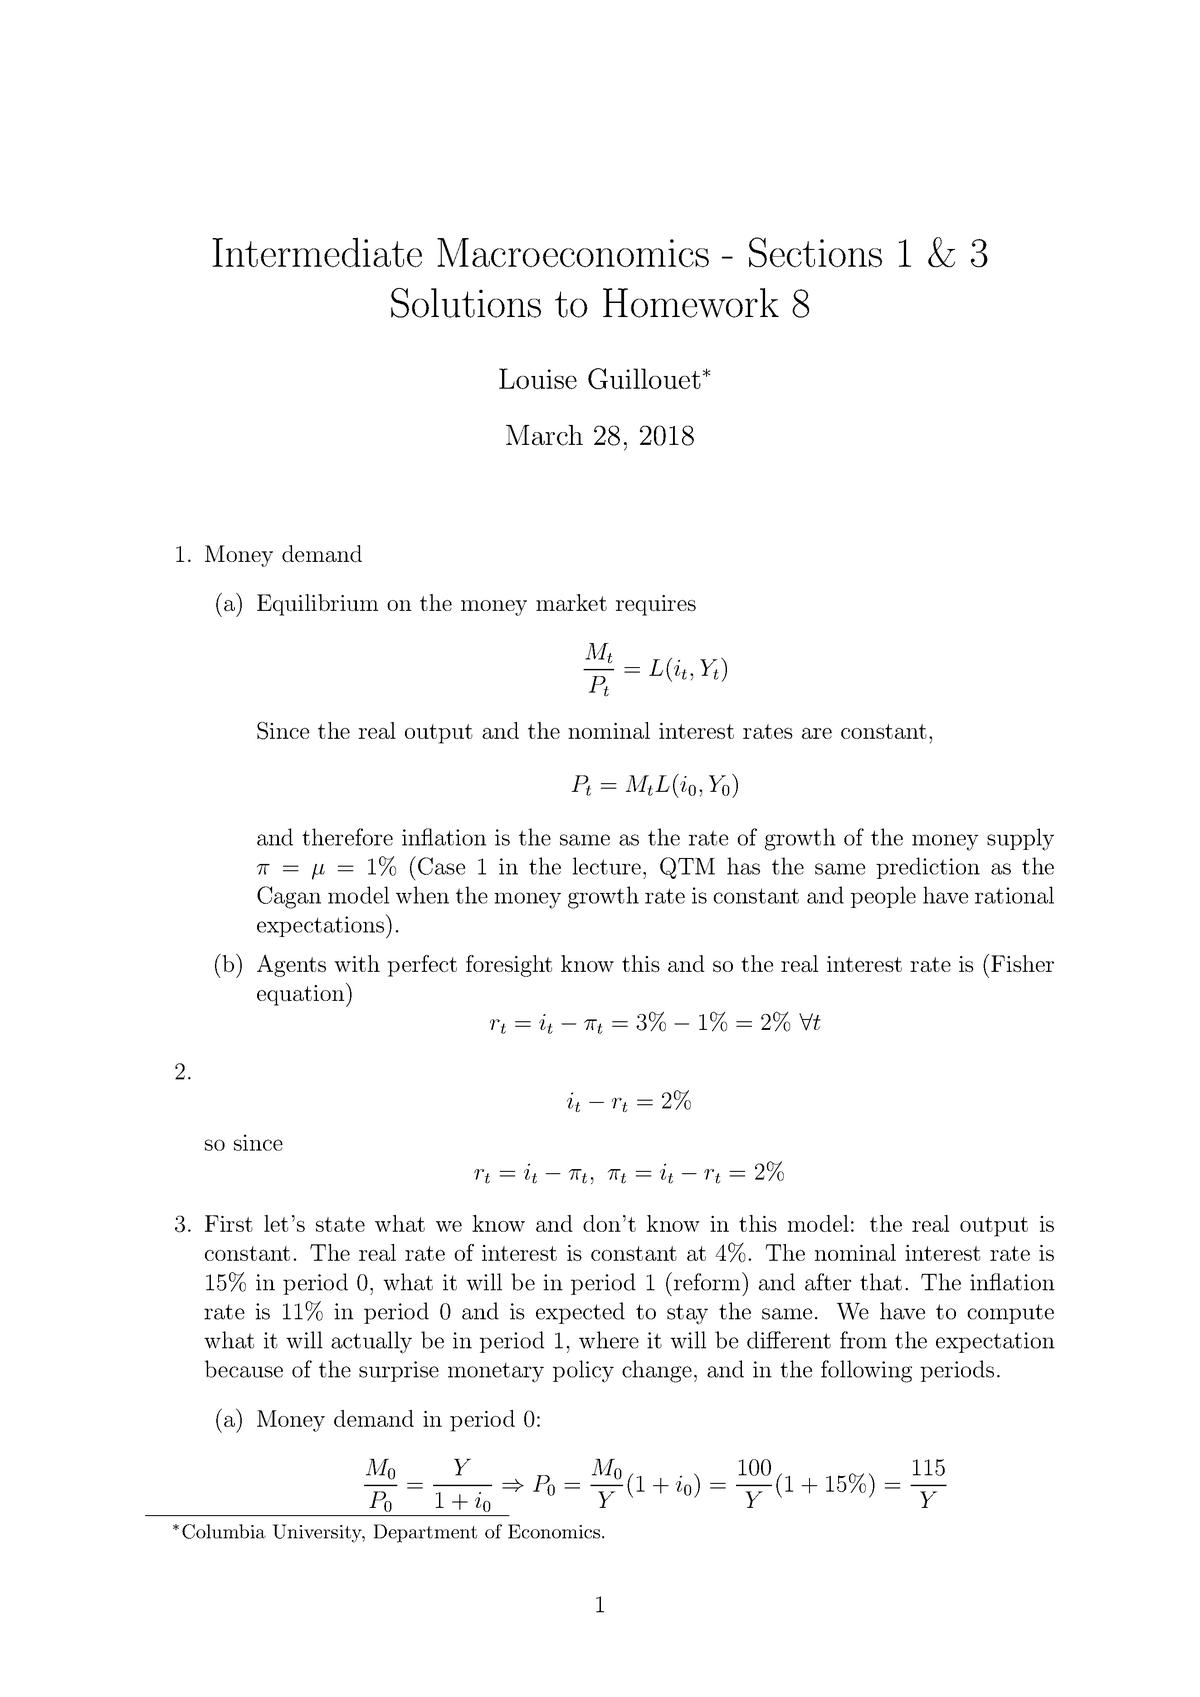 Hwk8 sol - Homework solution - ECON 3213: Intermediate